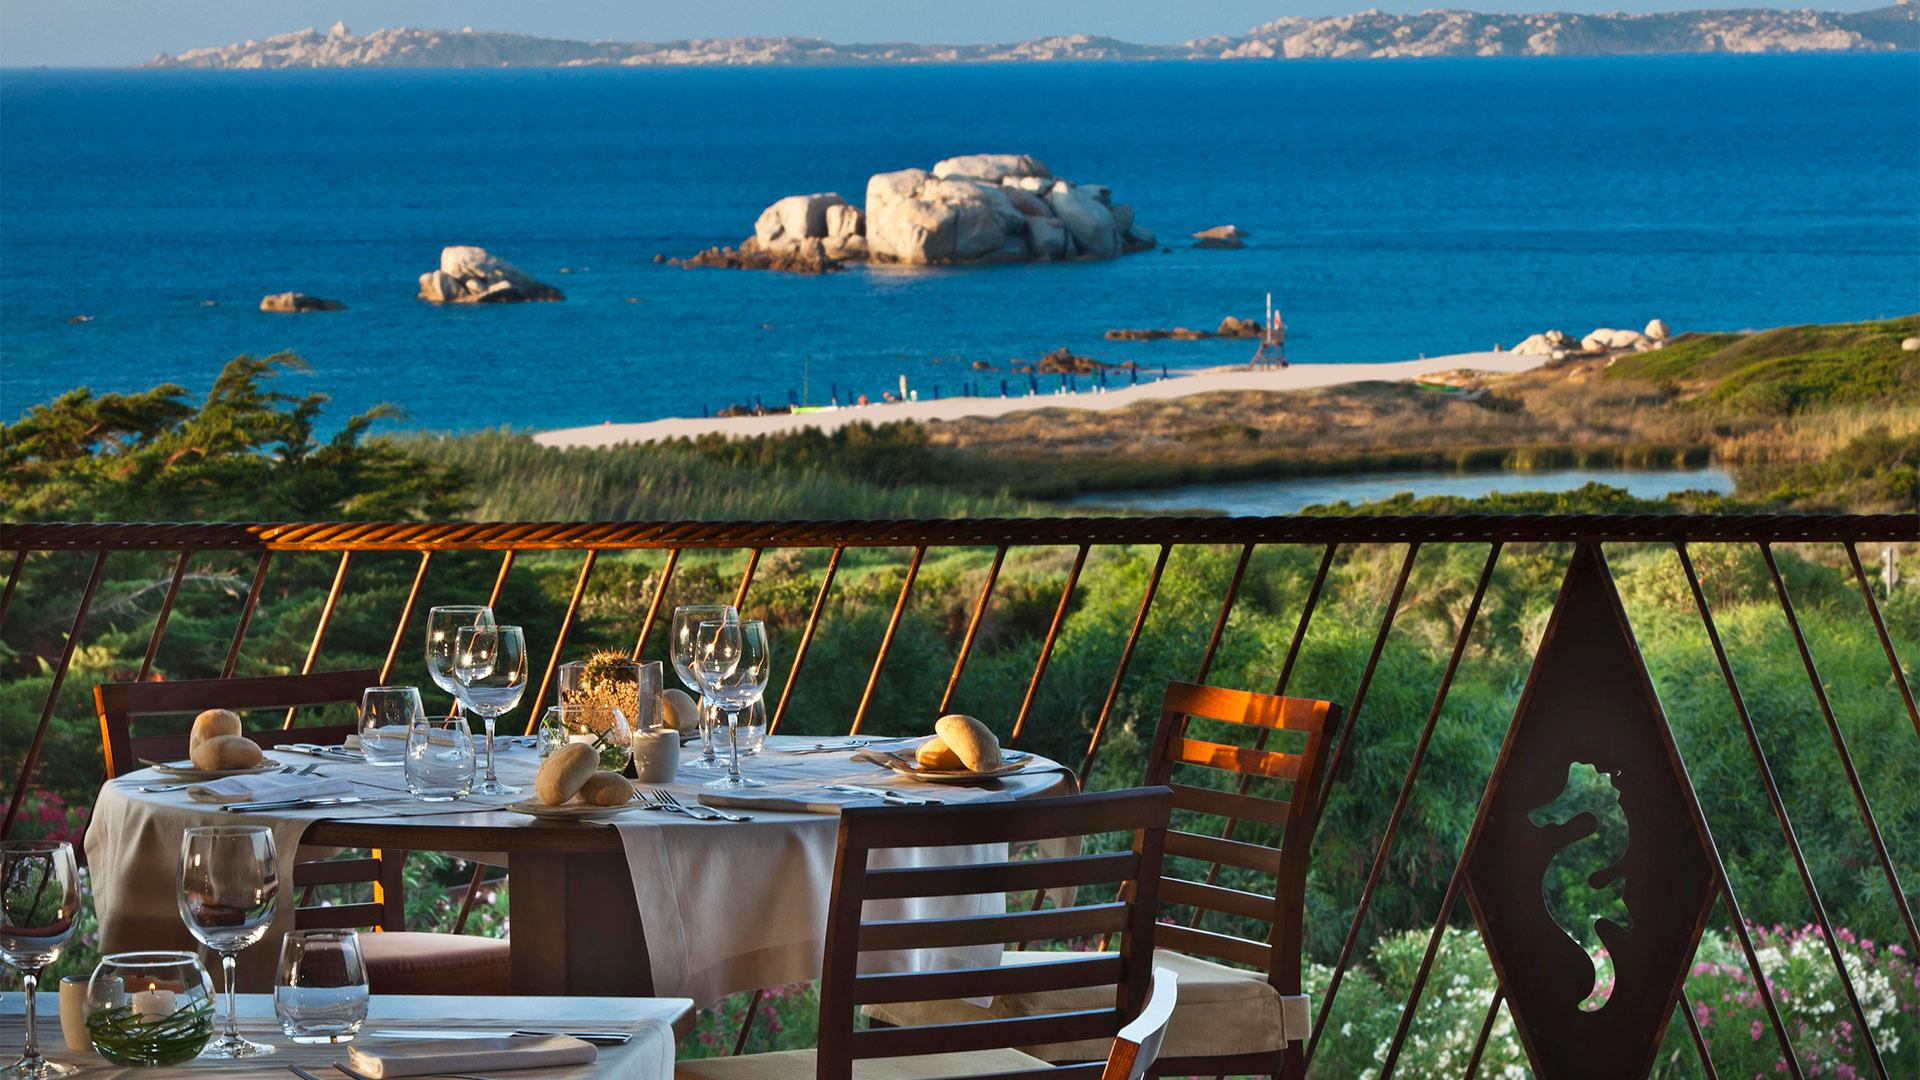 resort-valle-erica-slider-ristoranti-bouches-sardegna-3